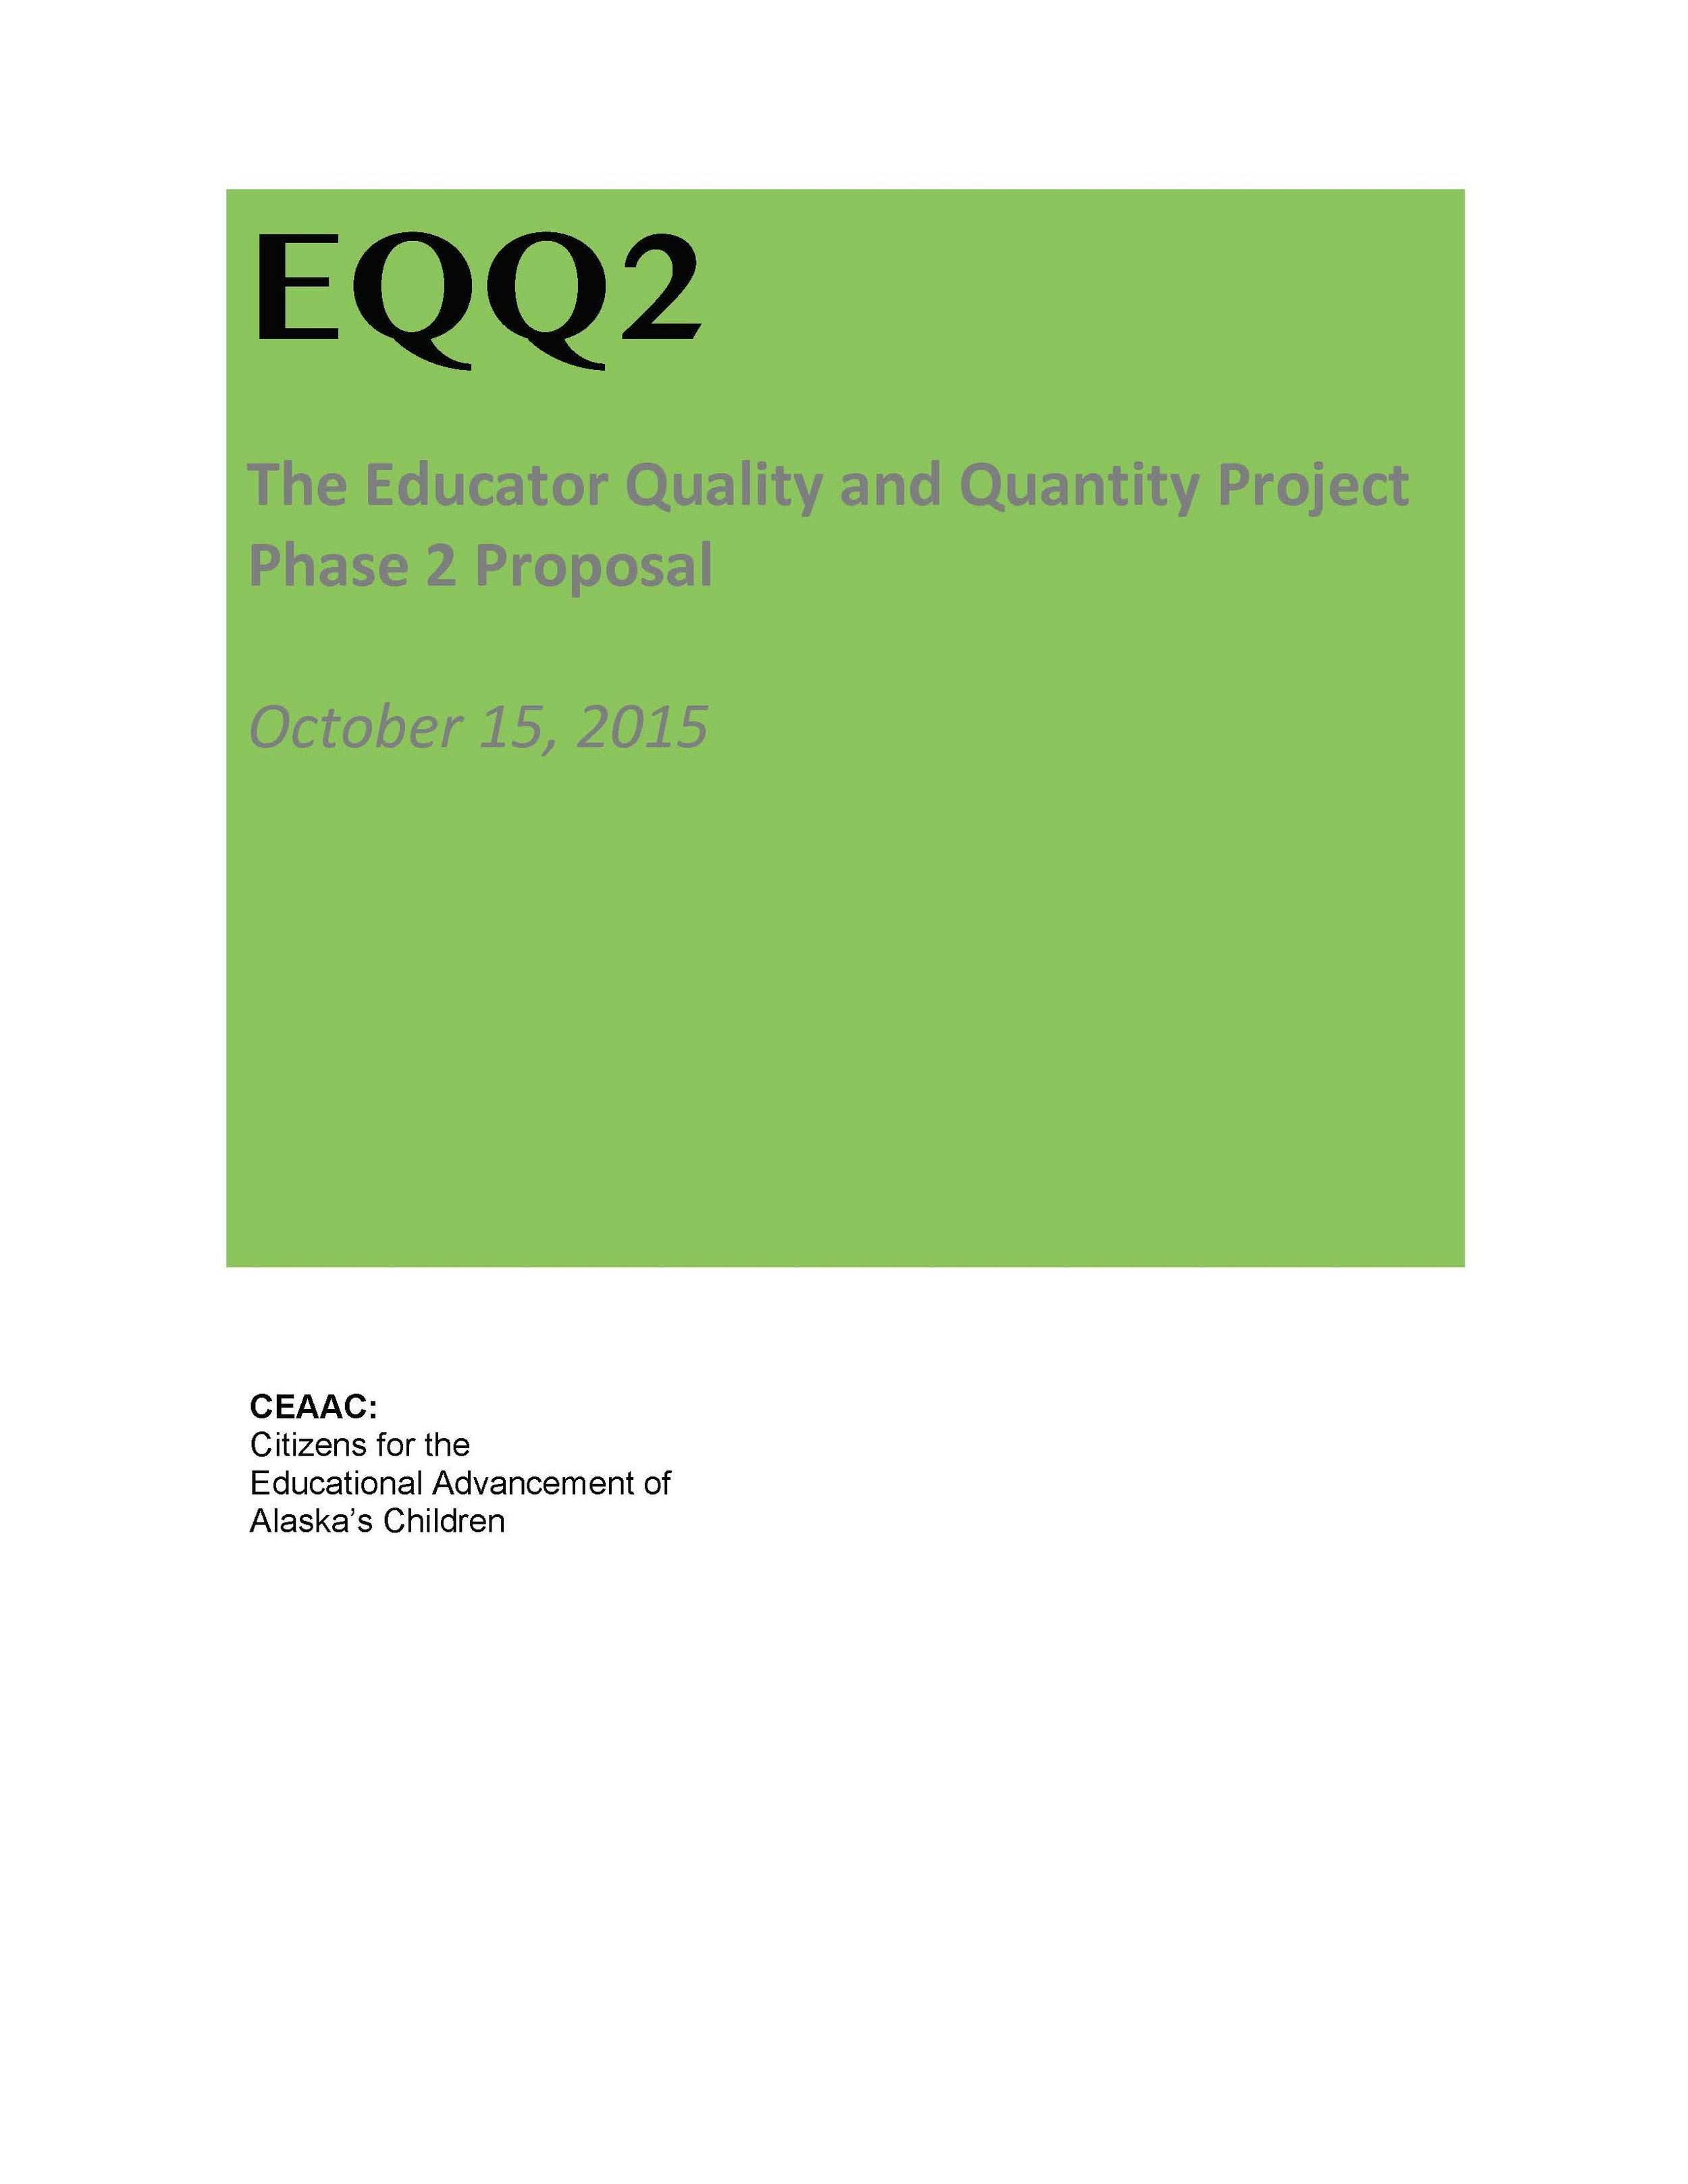 EQQ2 Image Link.jpg